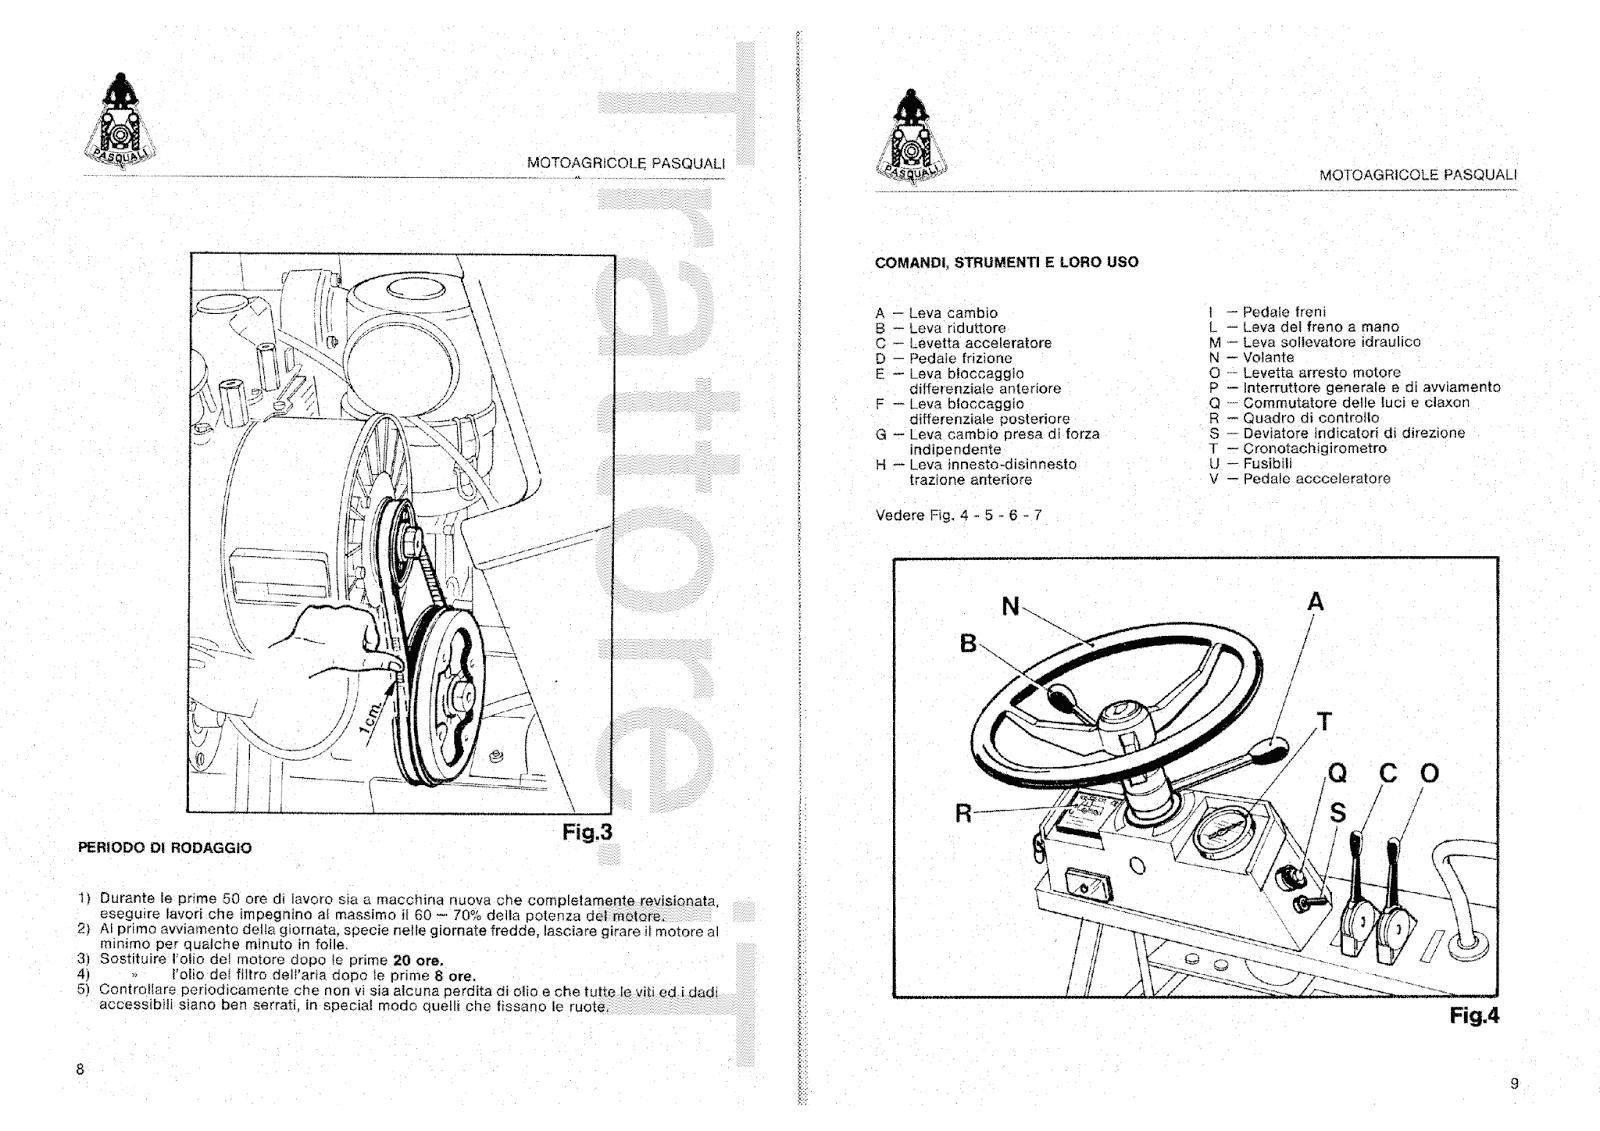 InfoTrattore.it: Motoagricola Pasquali 423 Manuale